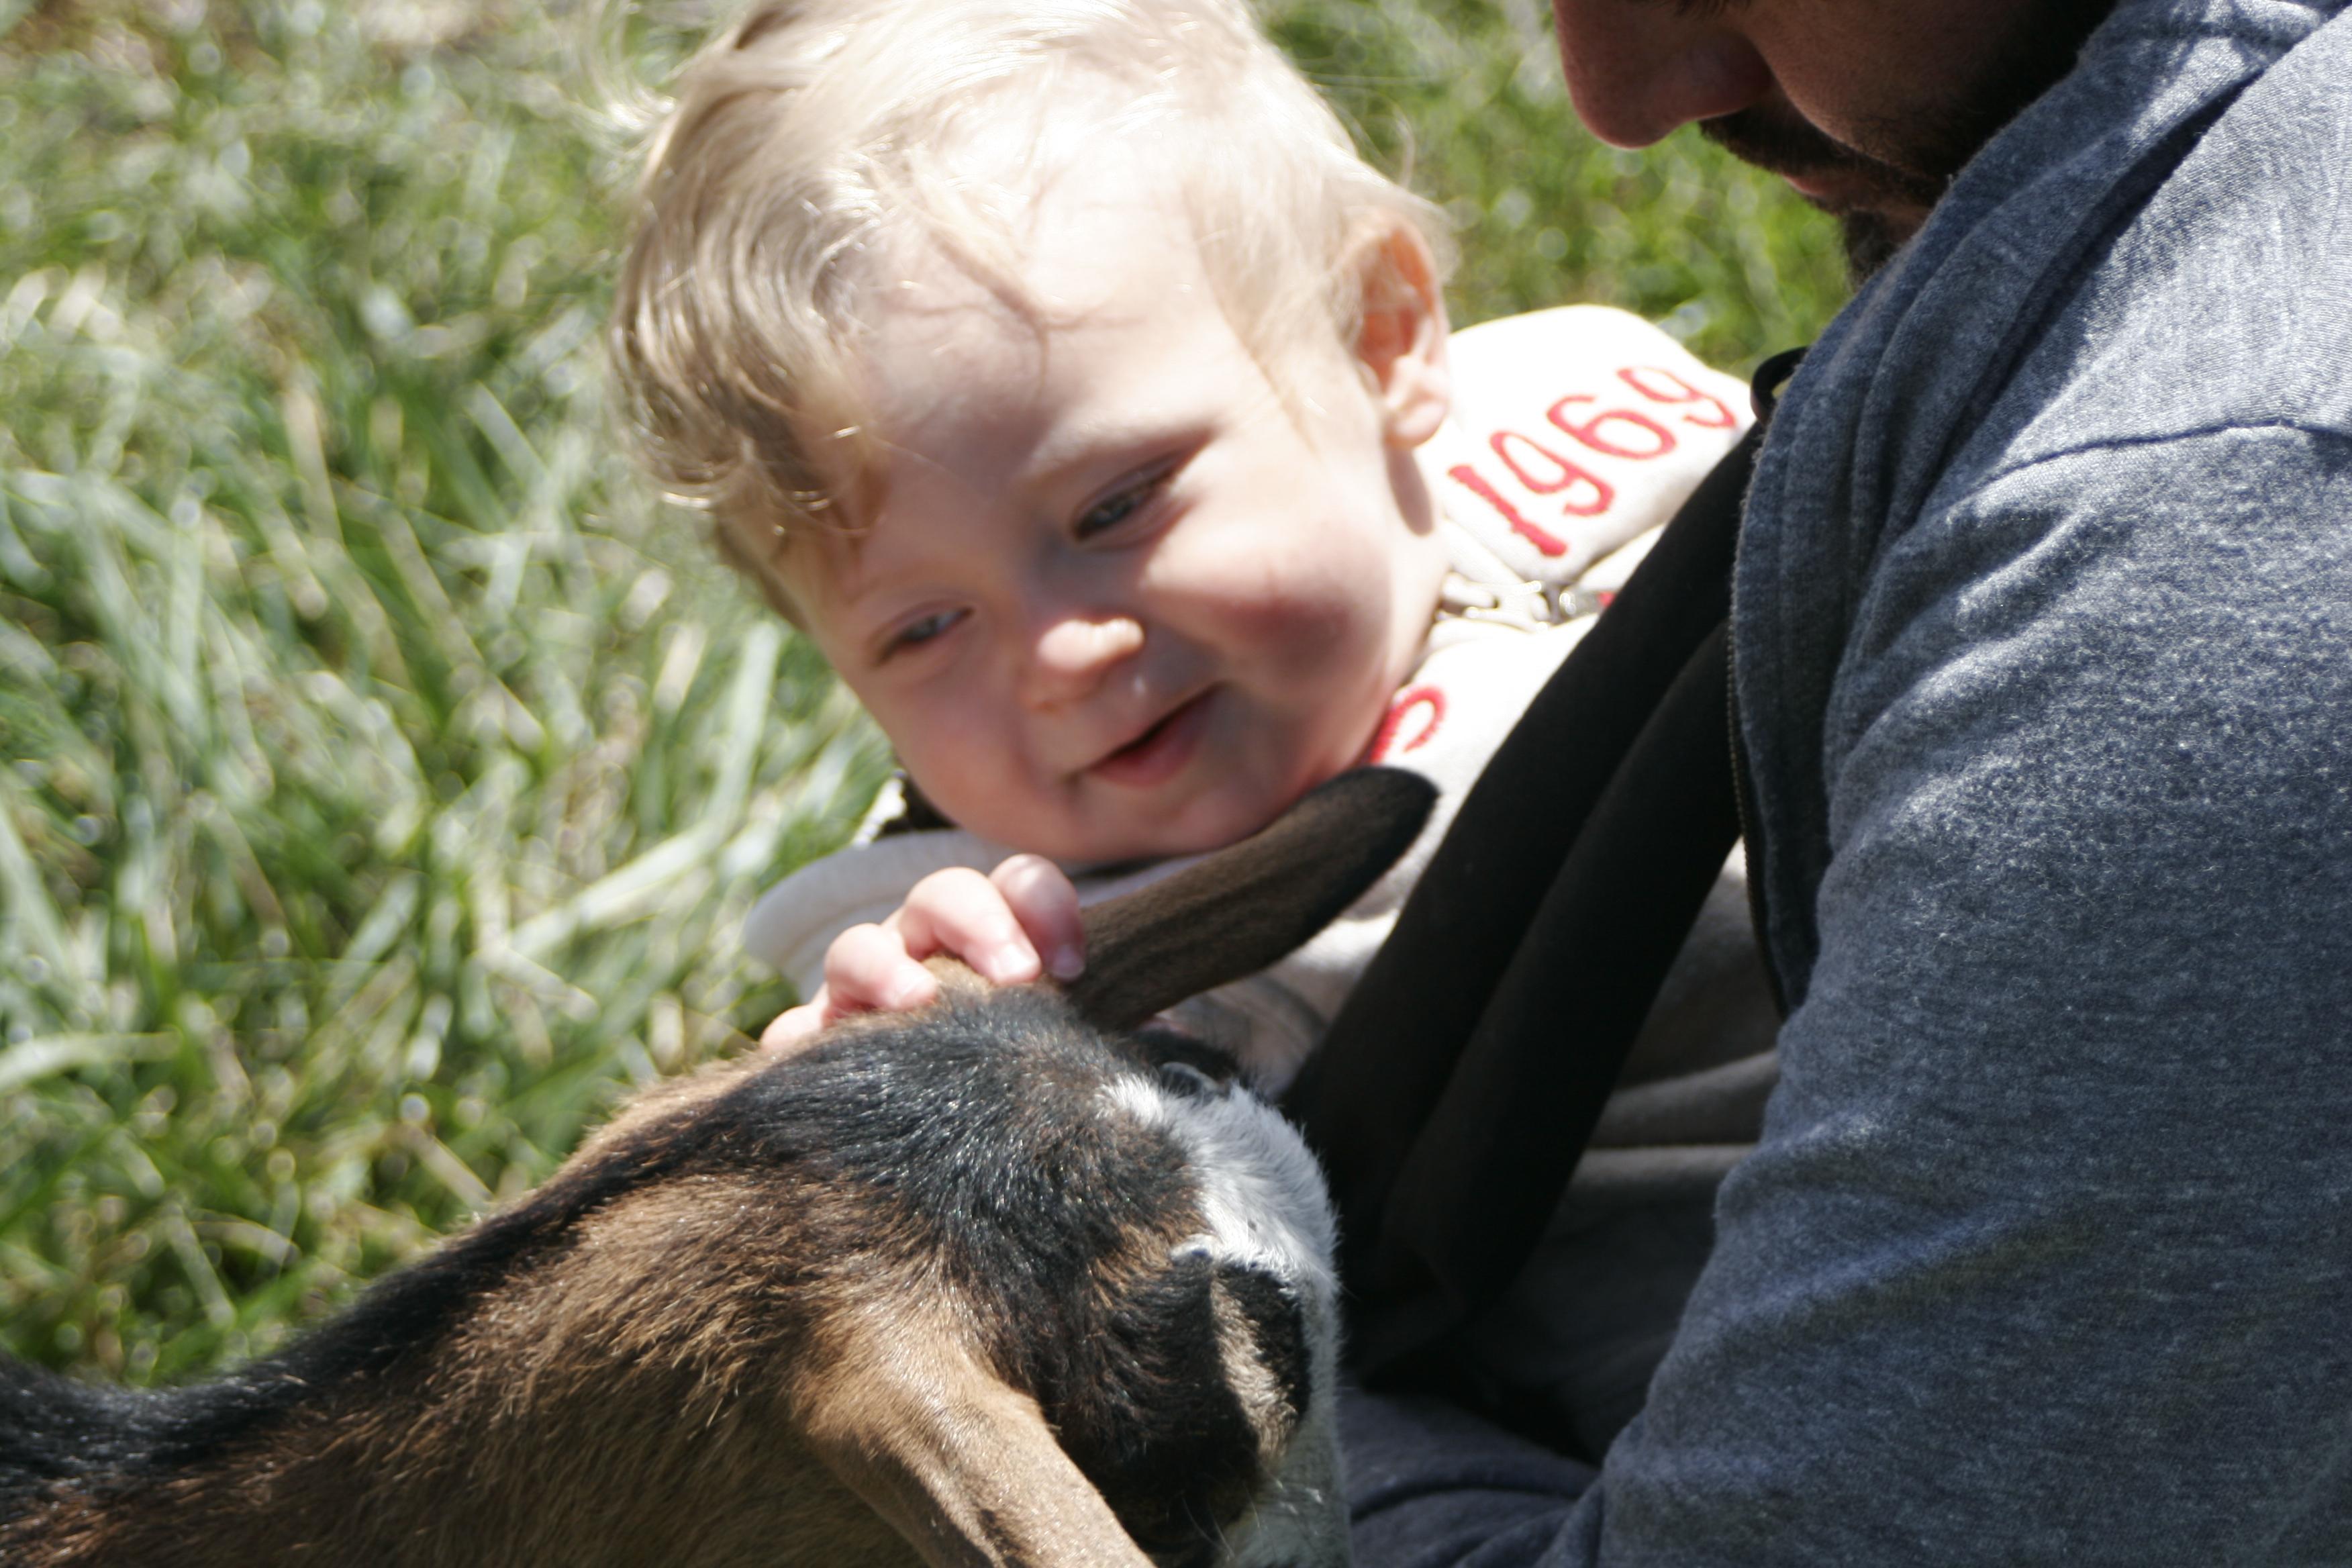 Pulling off goat ears